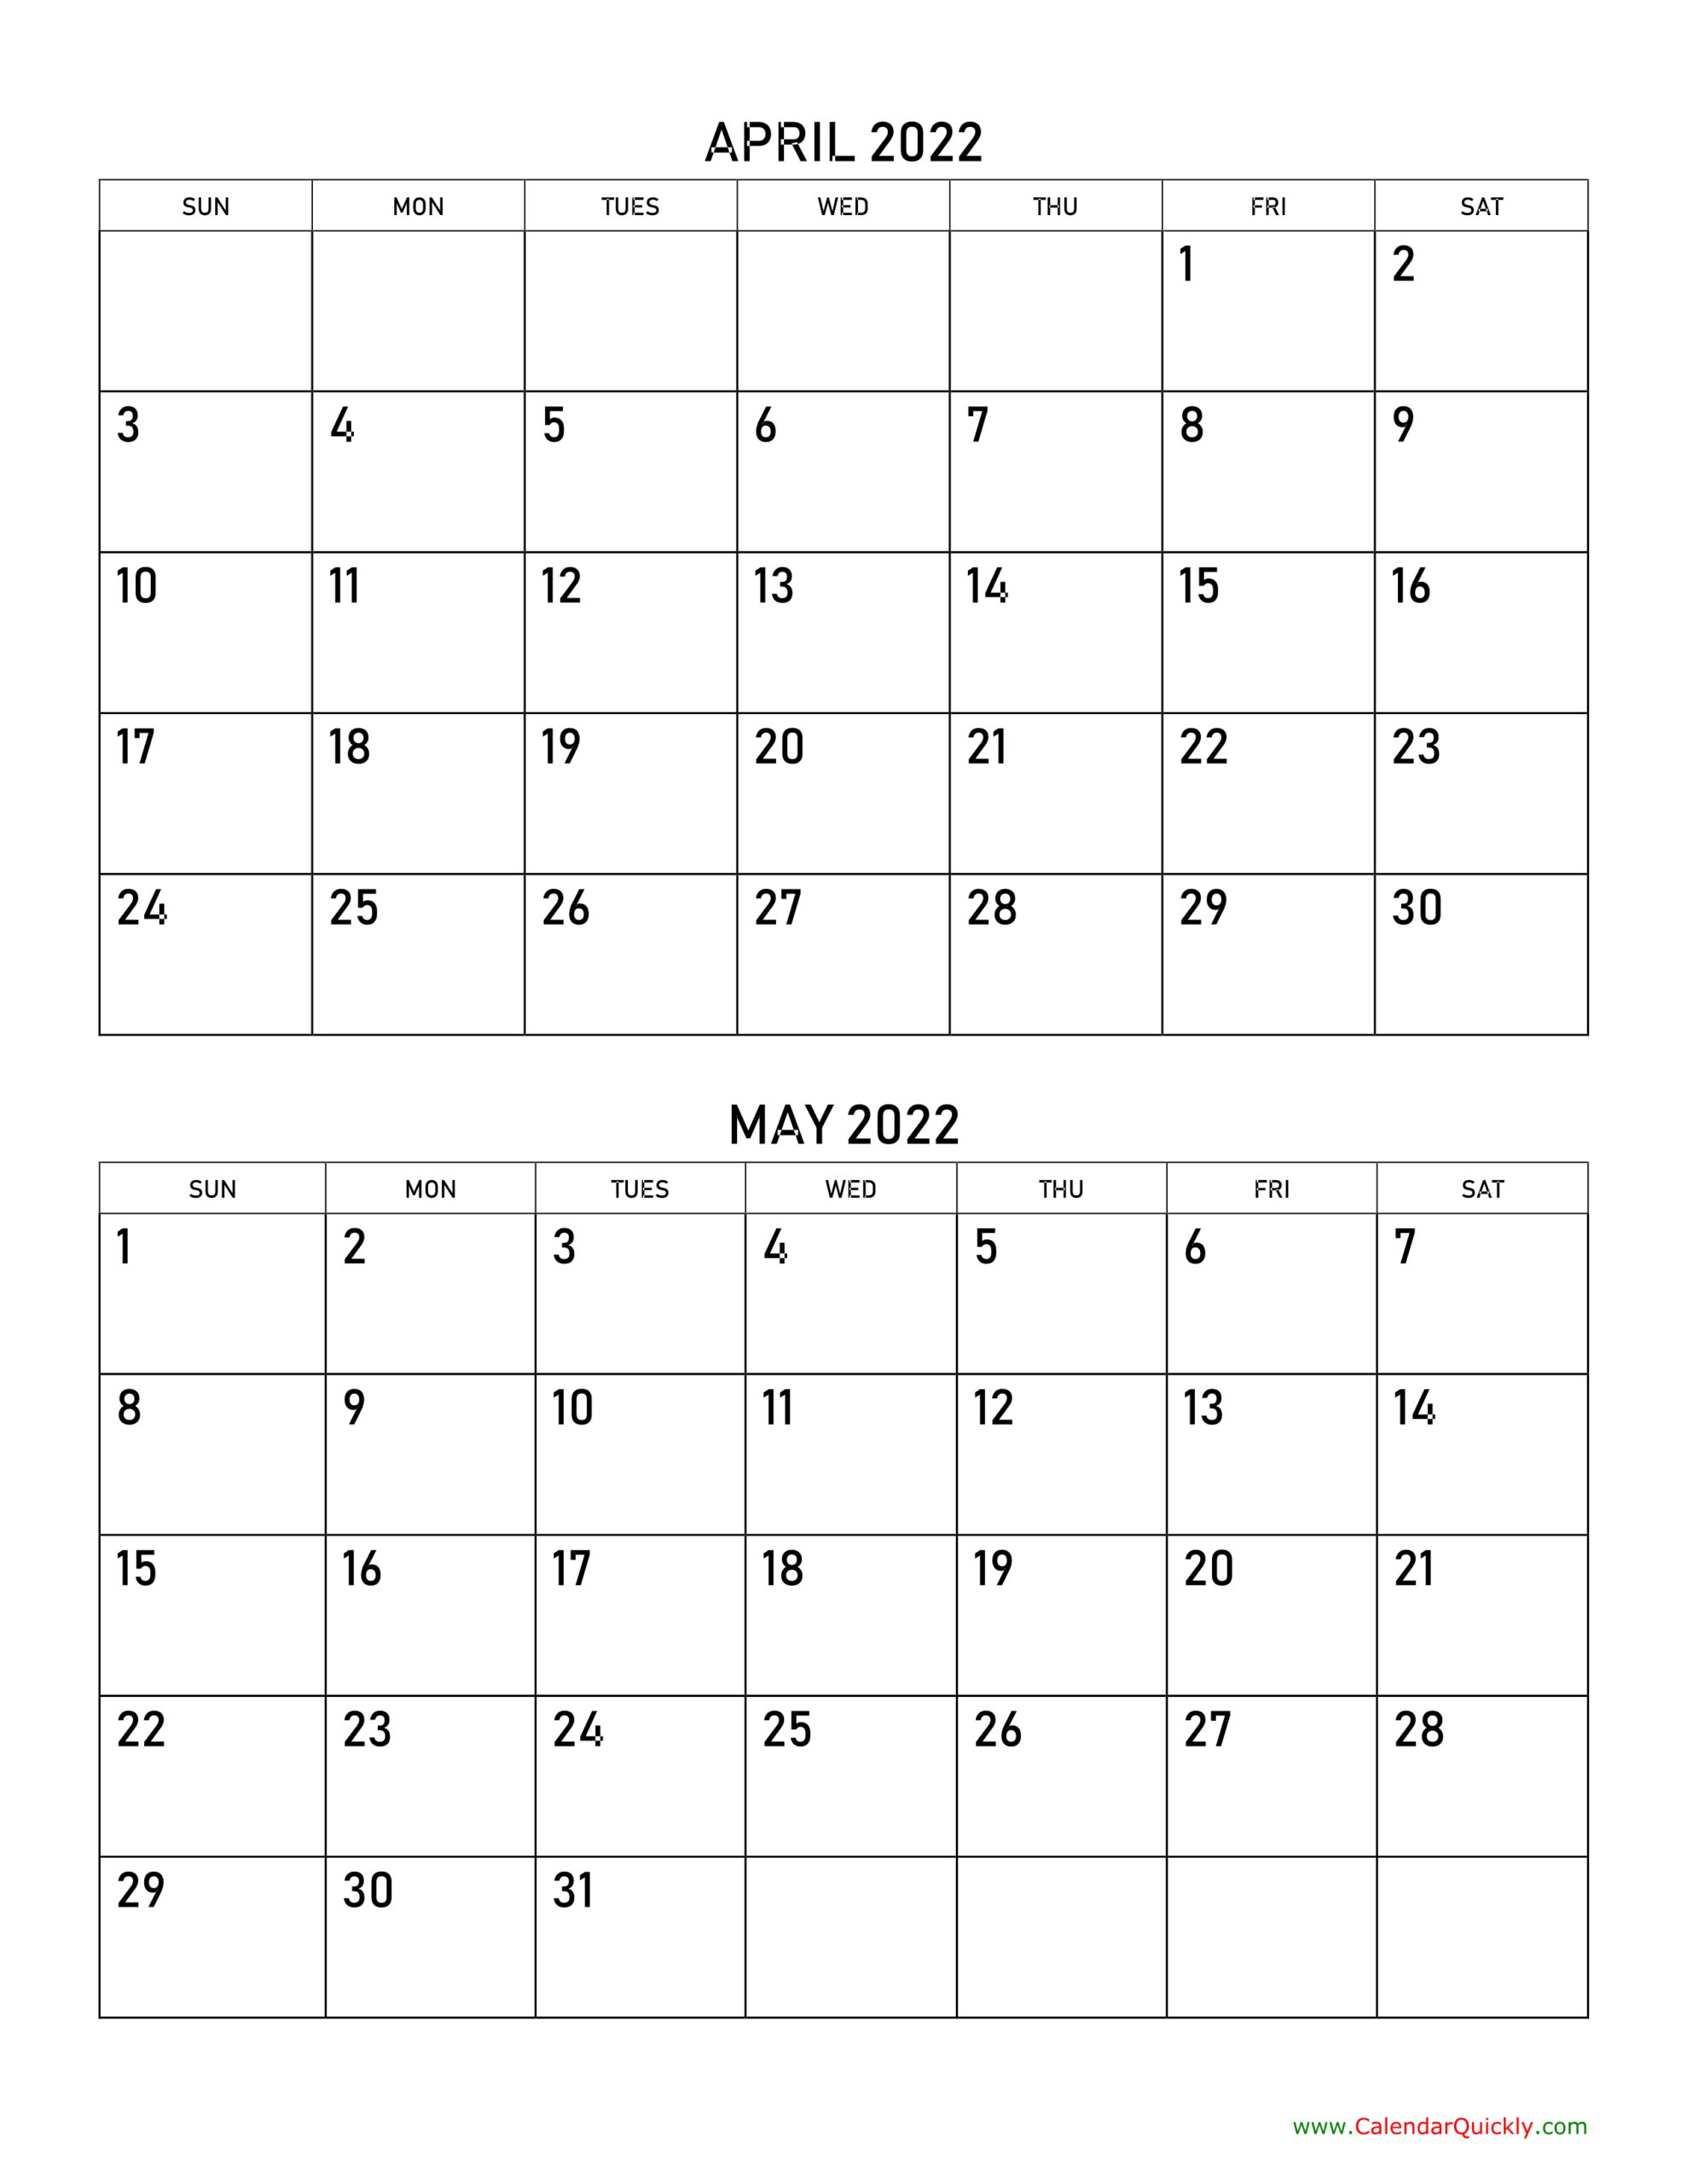 April And May 2022 Calendar   Calendar Quickly within April 2022 Calendar To Print Photo